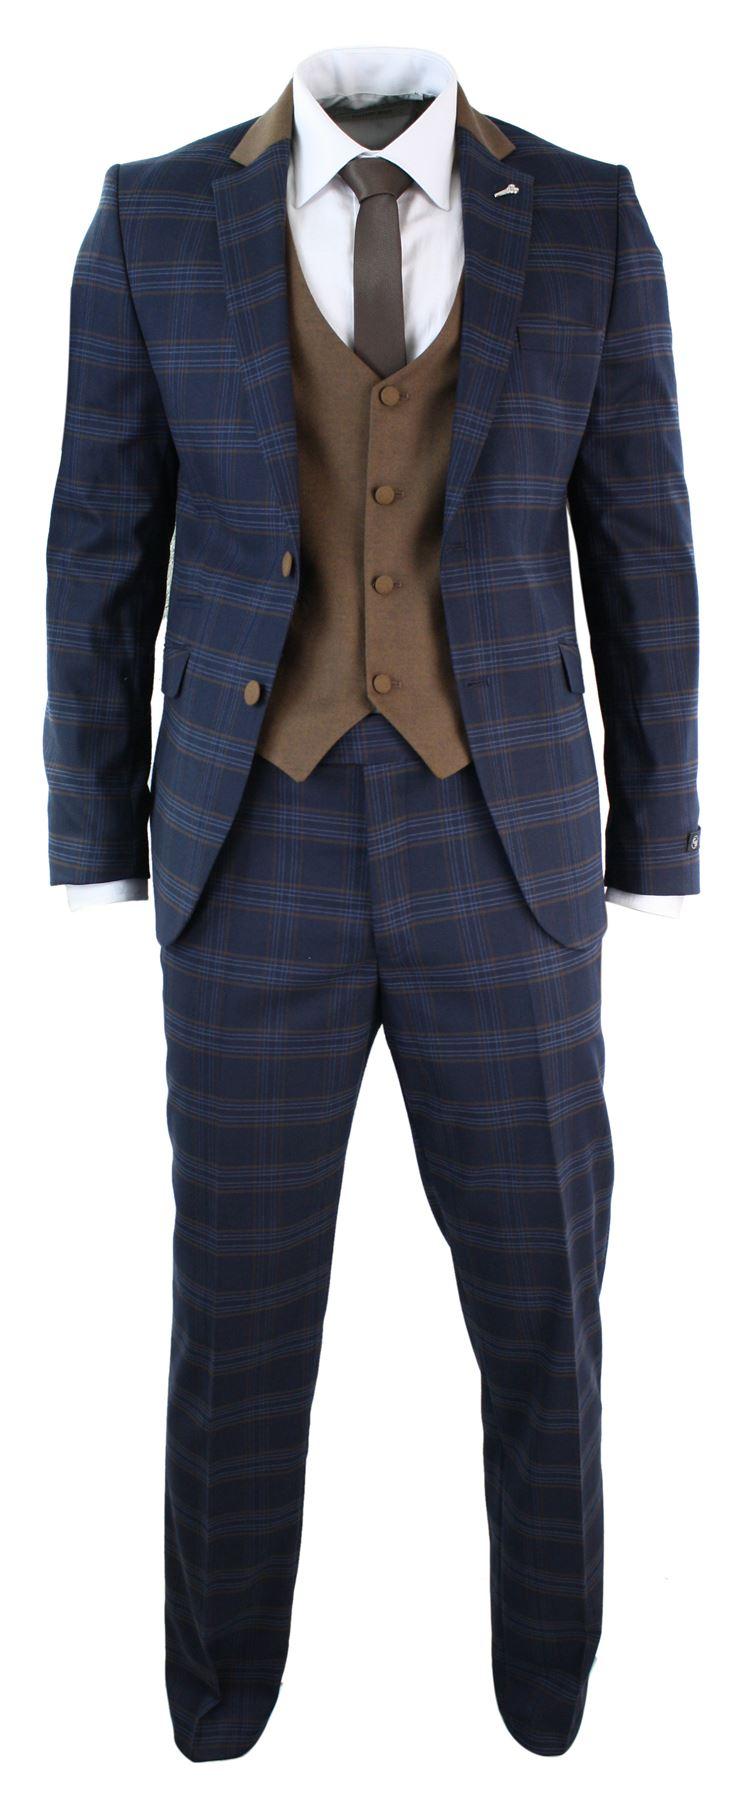 Mens 3 Piece Tweed Check Navy Blue 3 Piece Suit Slim Fit Retro ...